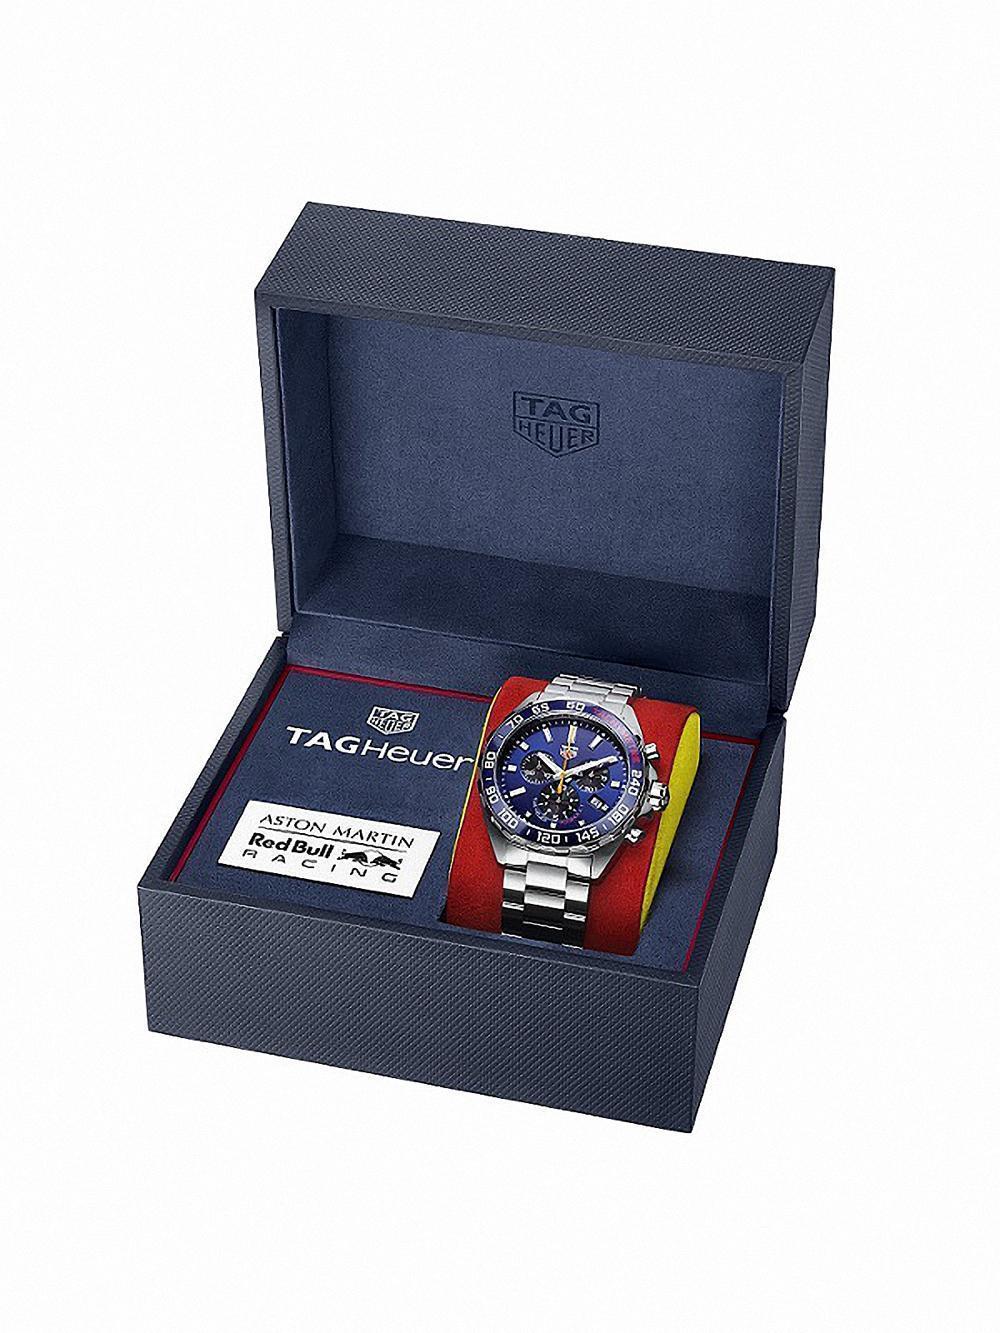 TAG Heuer ASTON MARTIN 紅牛F1車隊2020特別版聯名腕錶。